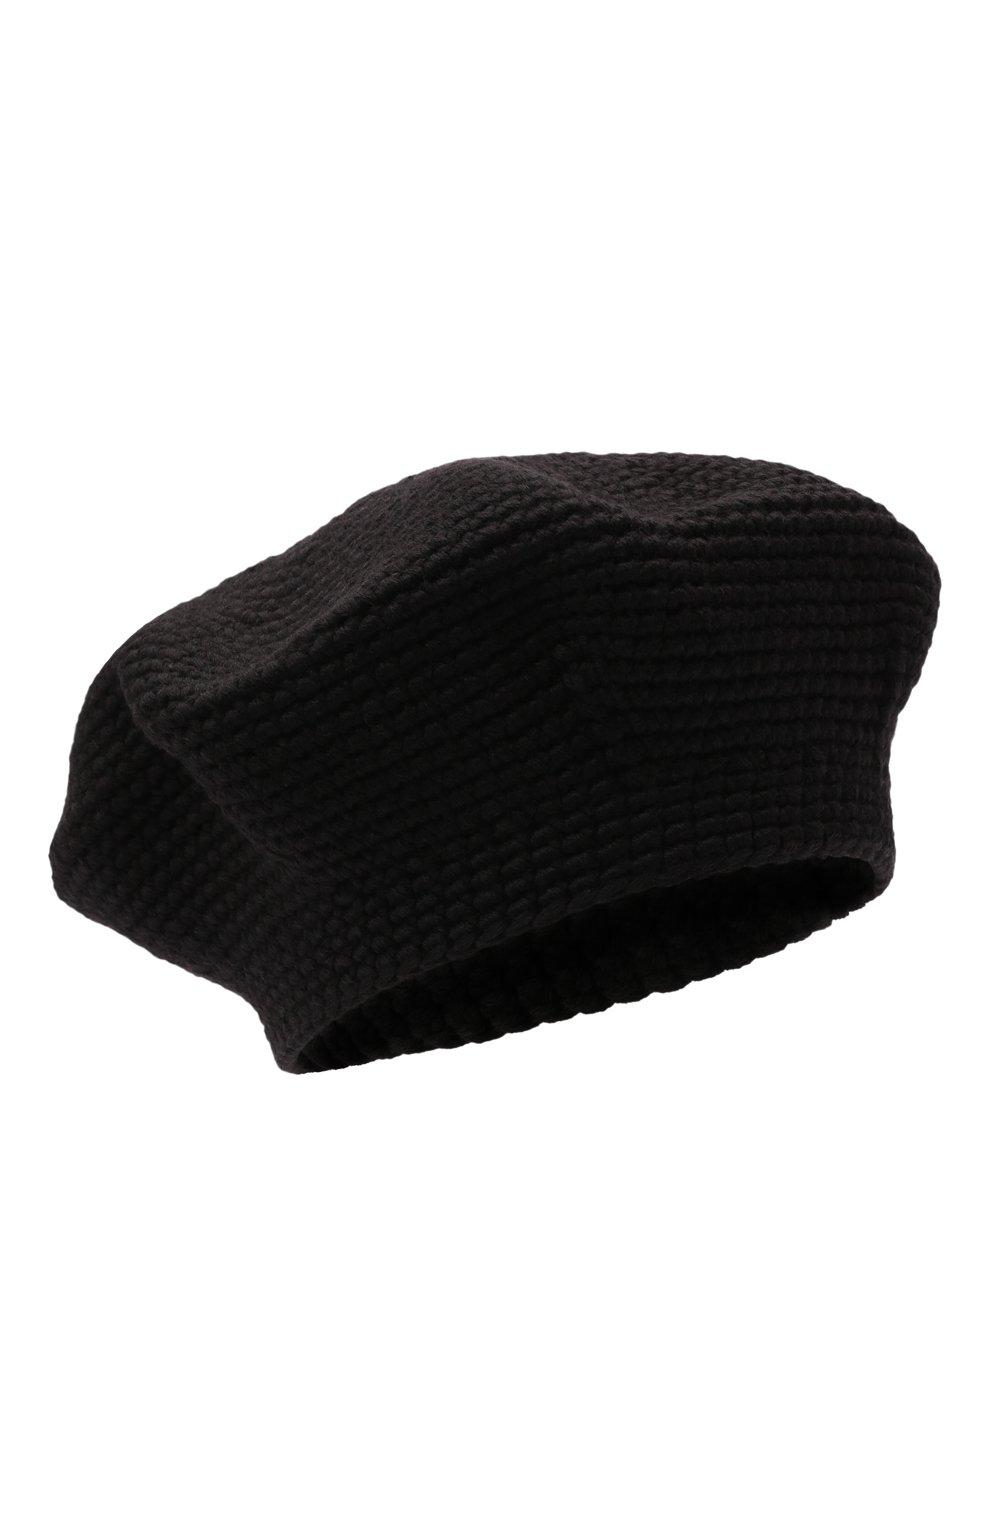 Женский берет LOW CLASSIC черного цвета, арт. L0W21FW_HA02BK | Фото 1 (Материал: Текстиль, Шерсть, Синтетический материал)